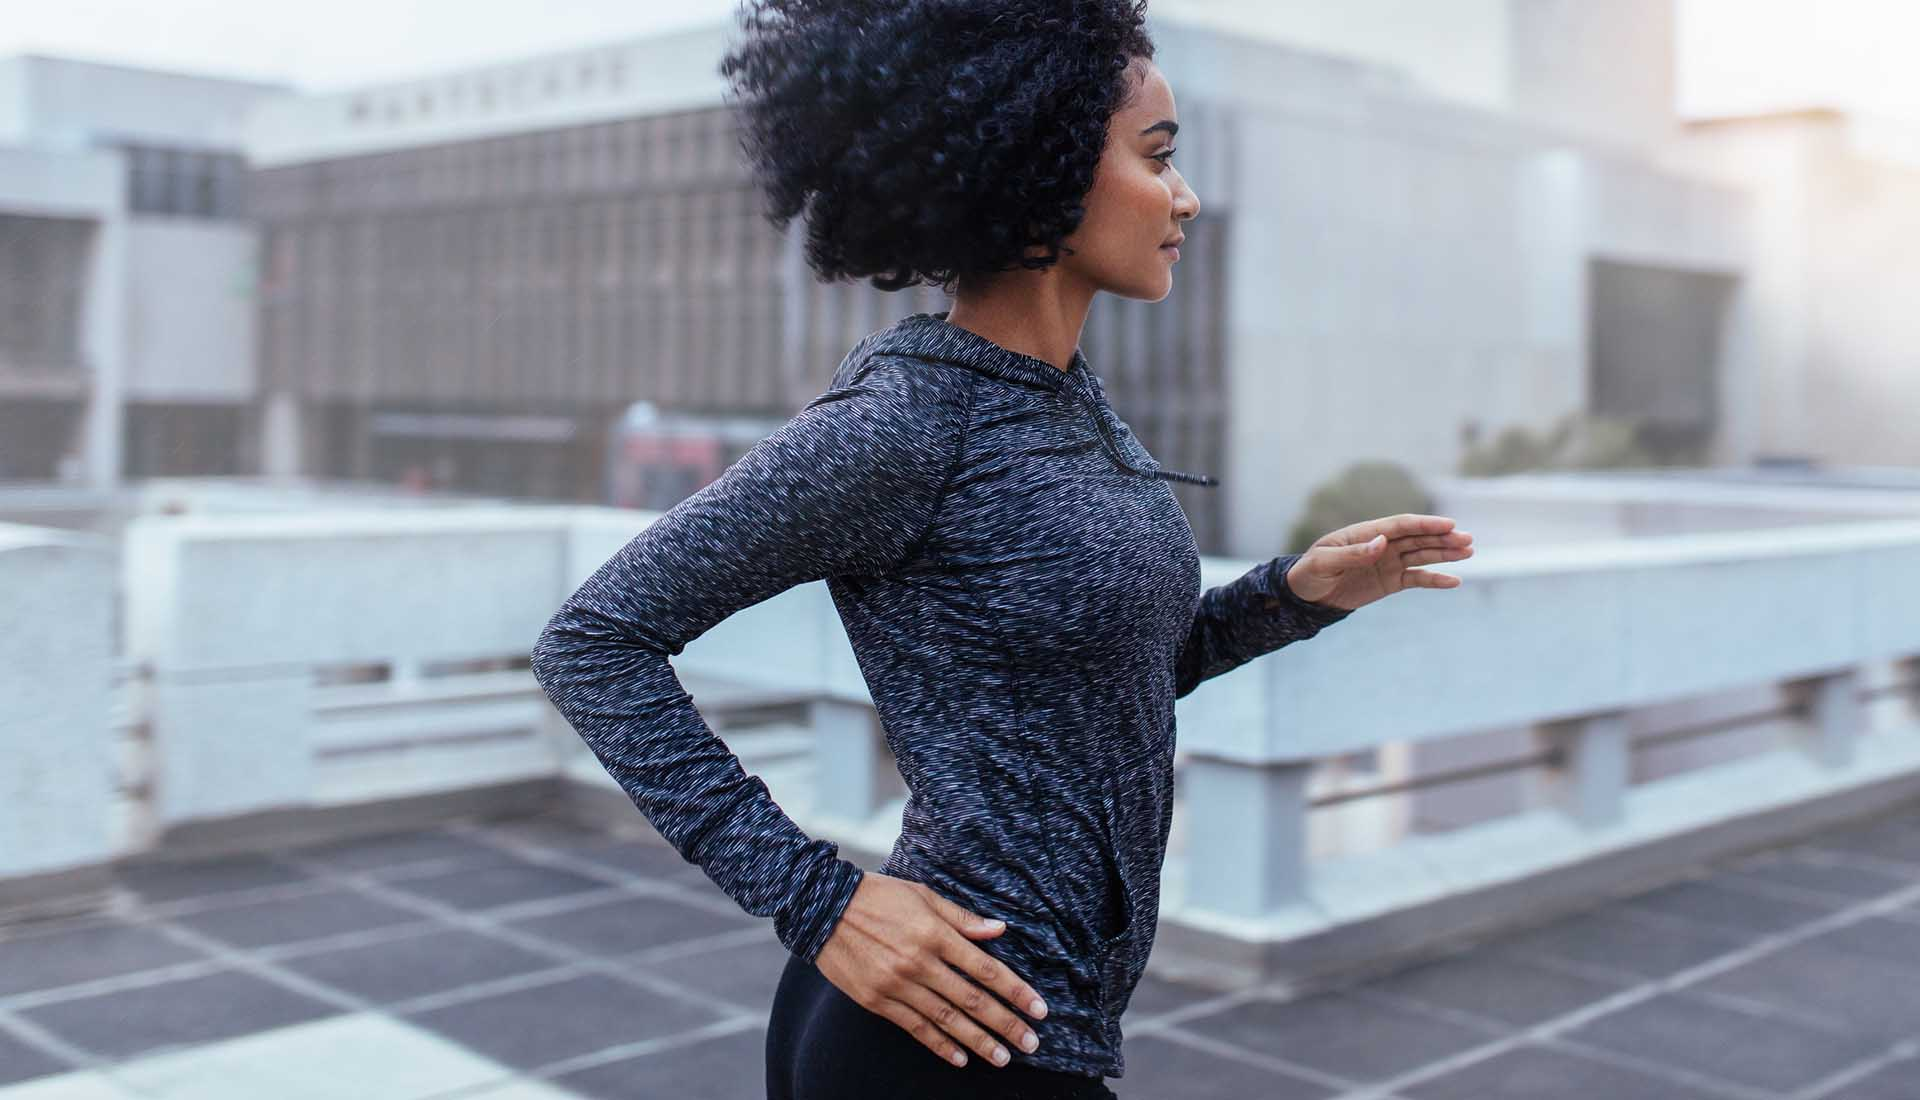 Female athlete in jogging in city.